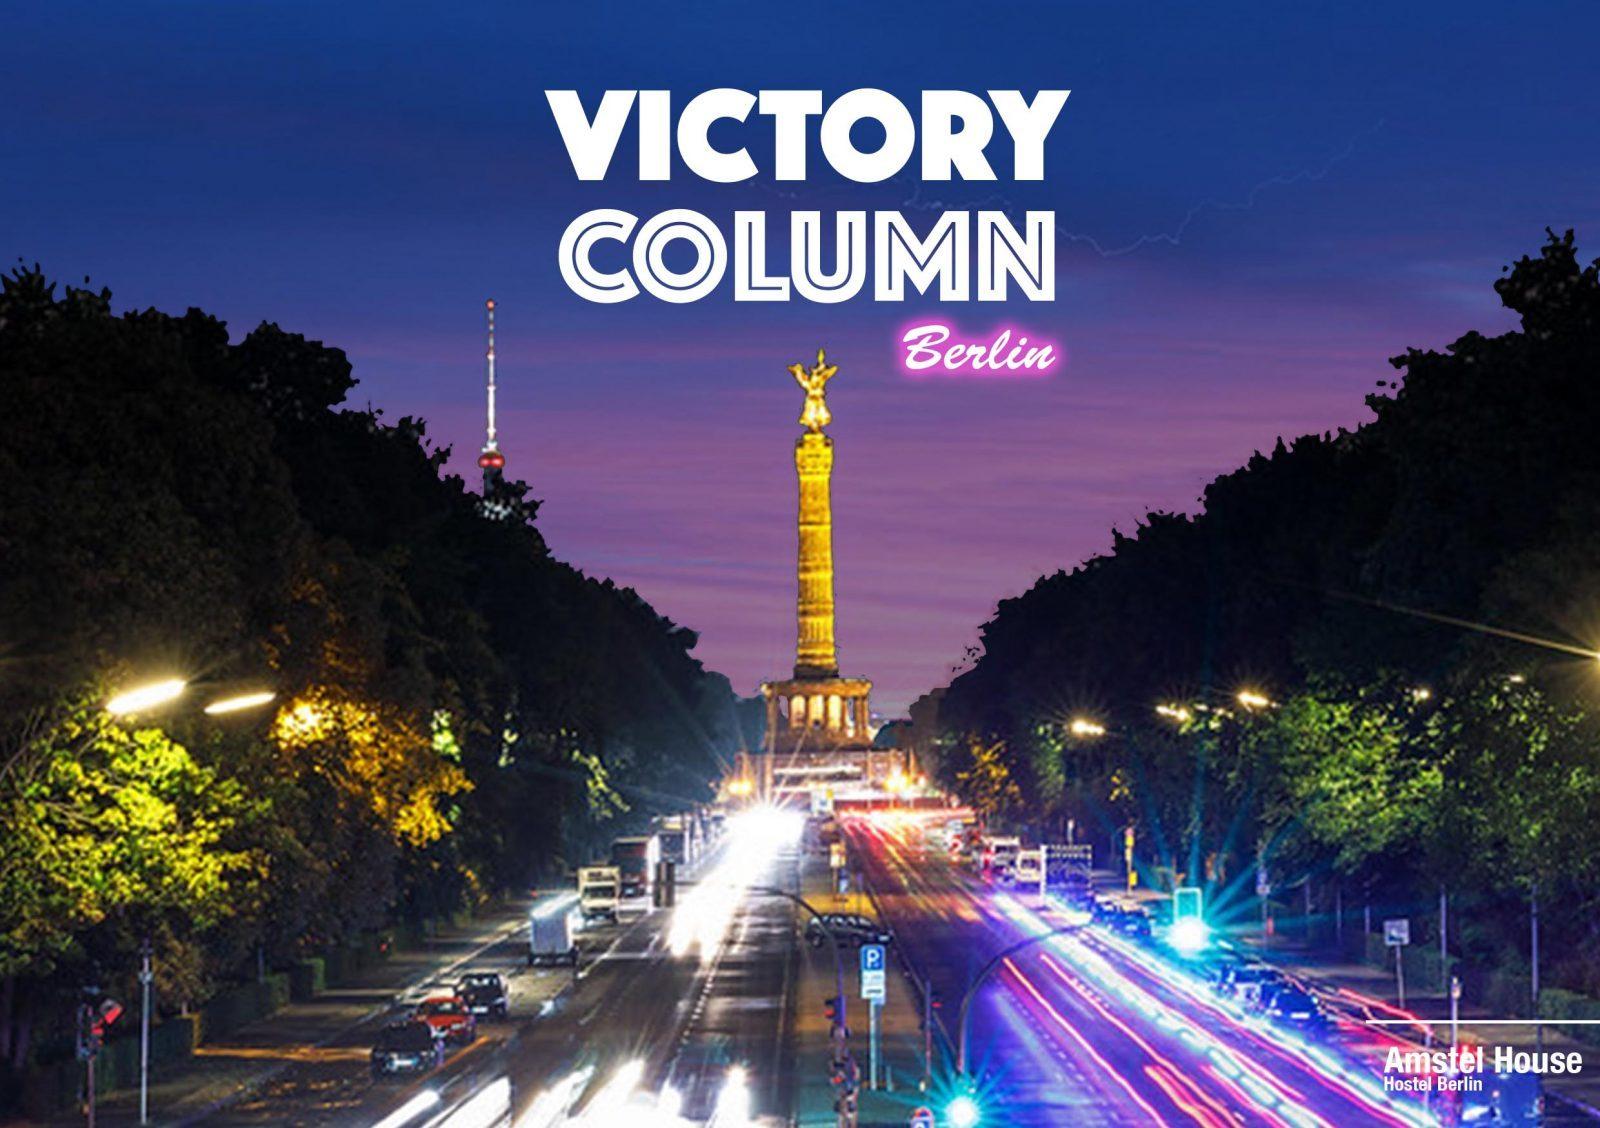 Berlin Victory Column Siegessäle